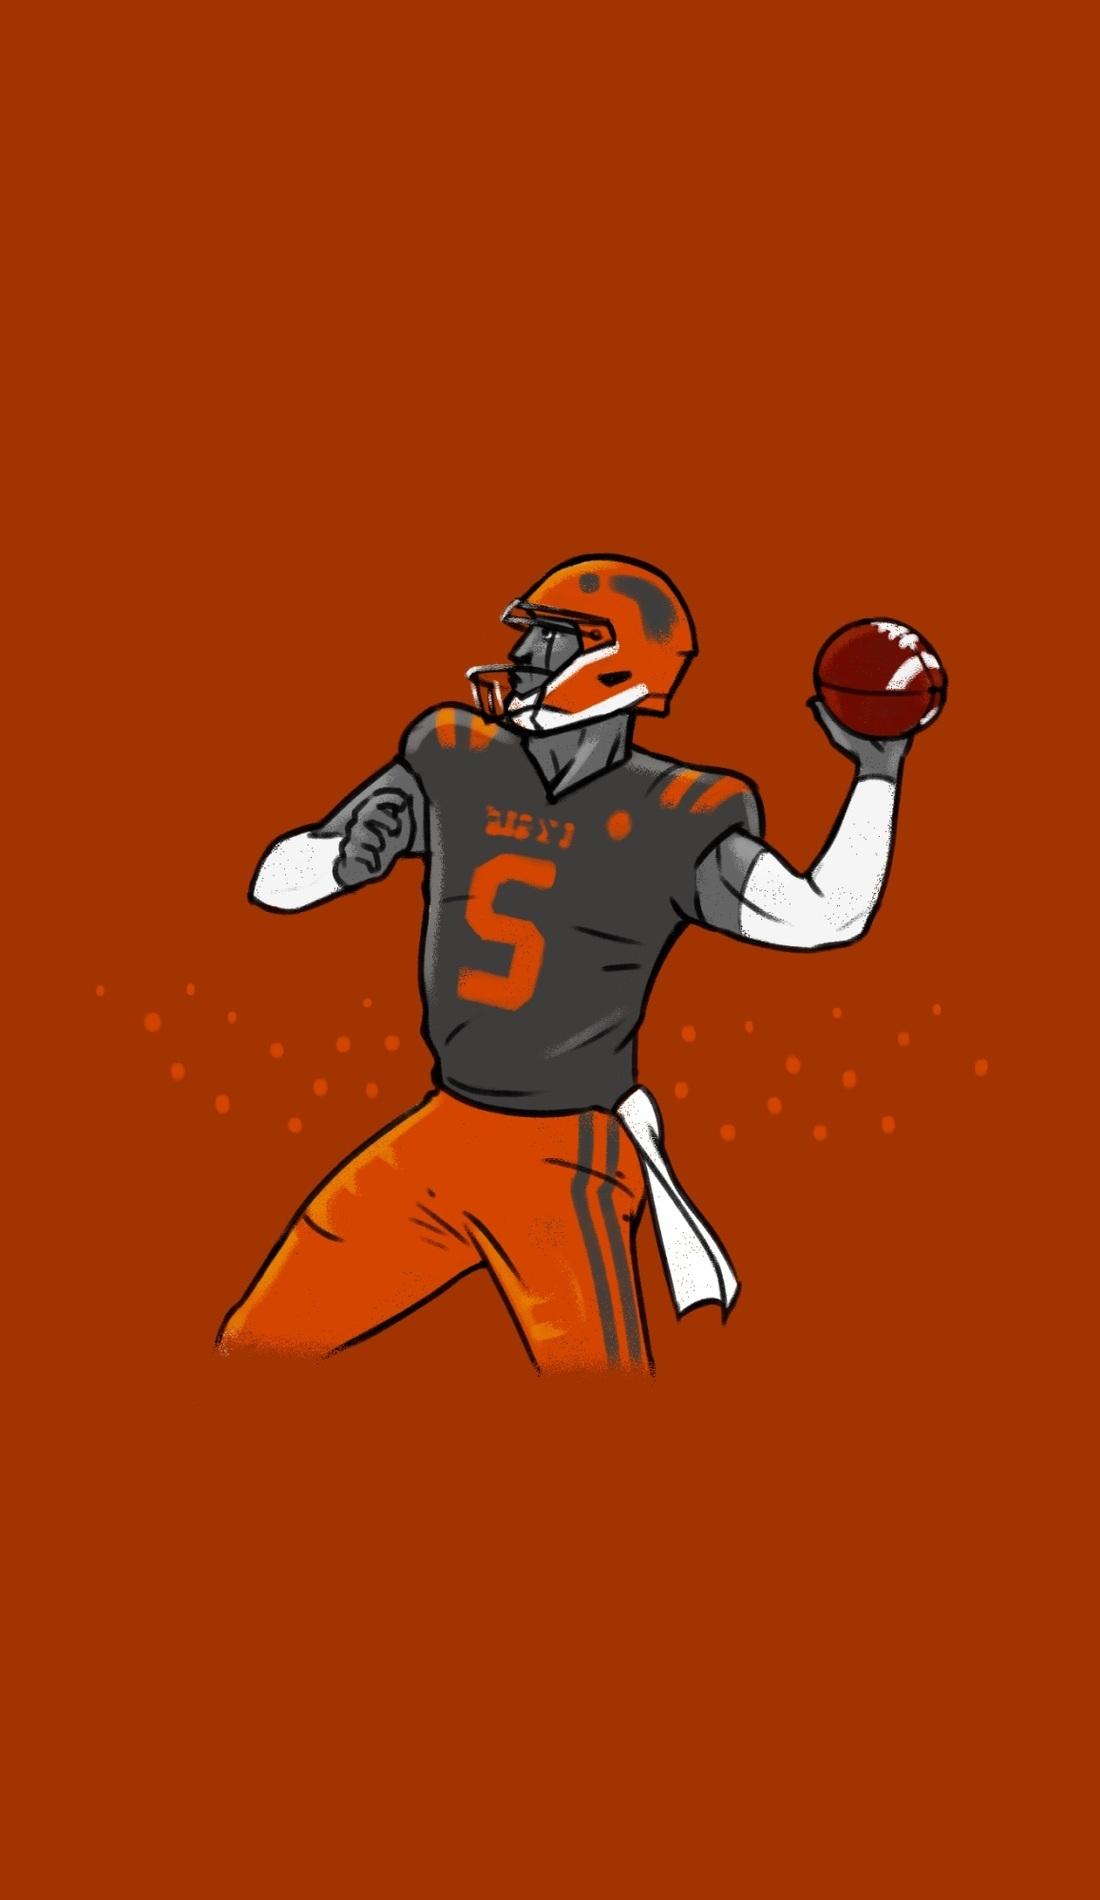 A Syracuse Orange Football live event